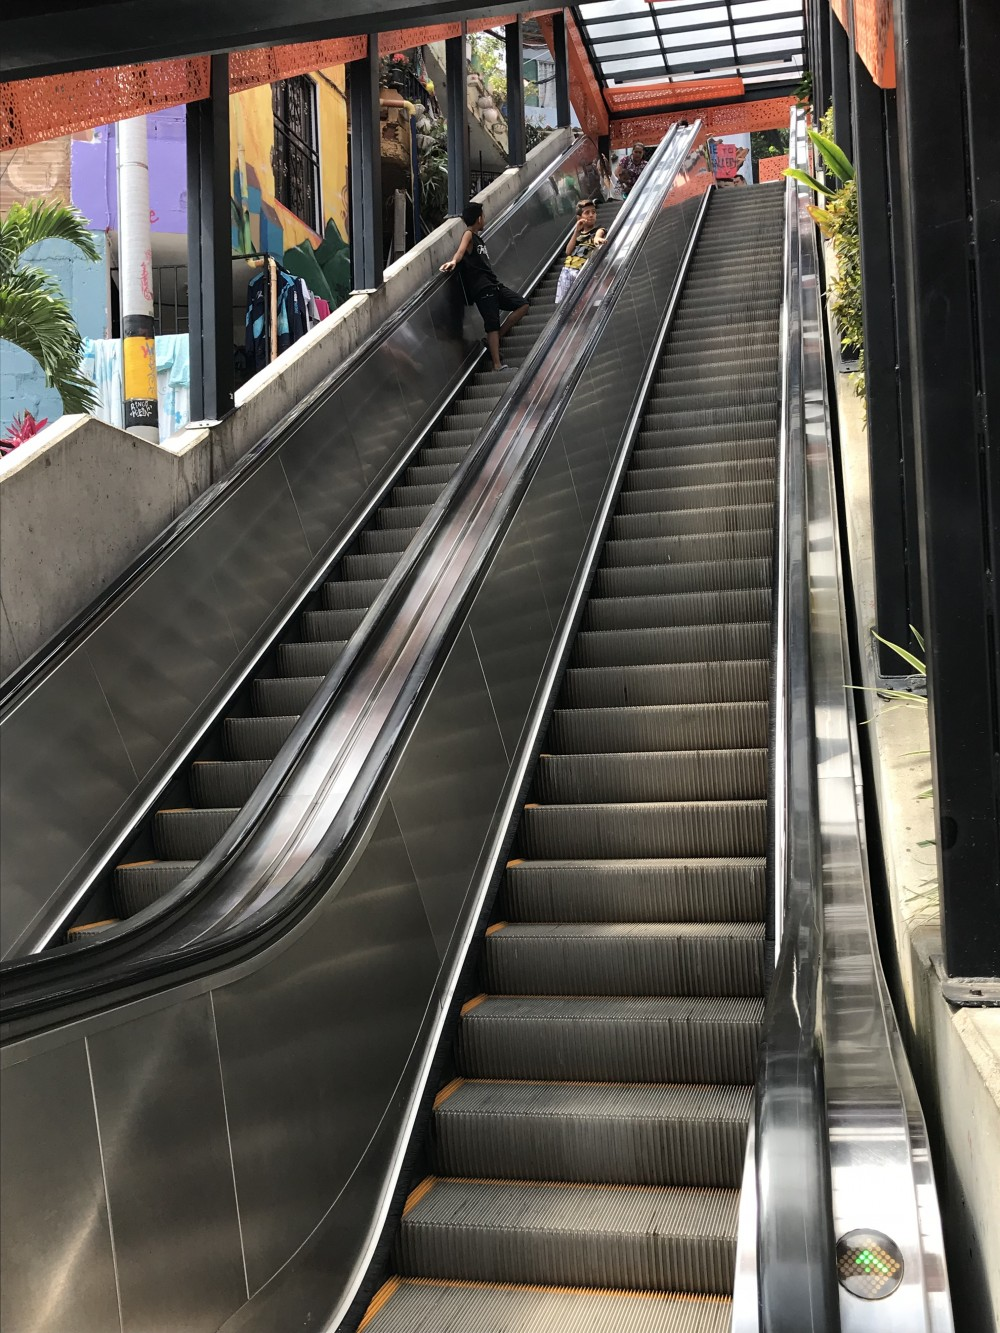 colombie-medellin-comuna13-escalator-helene